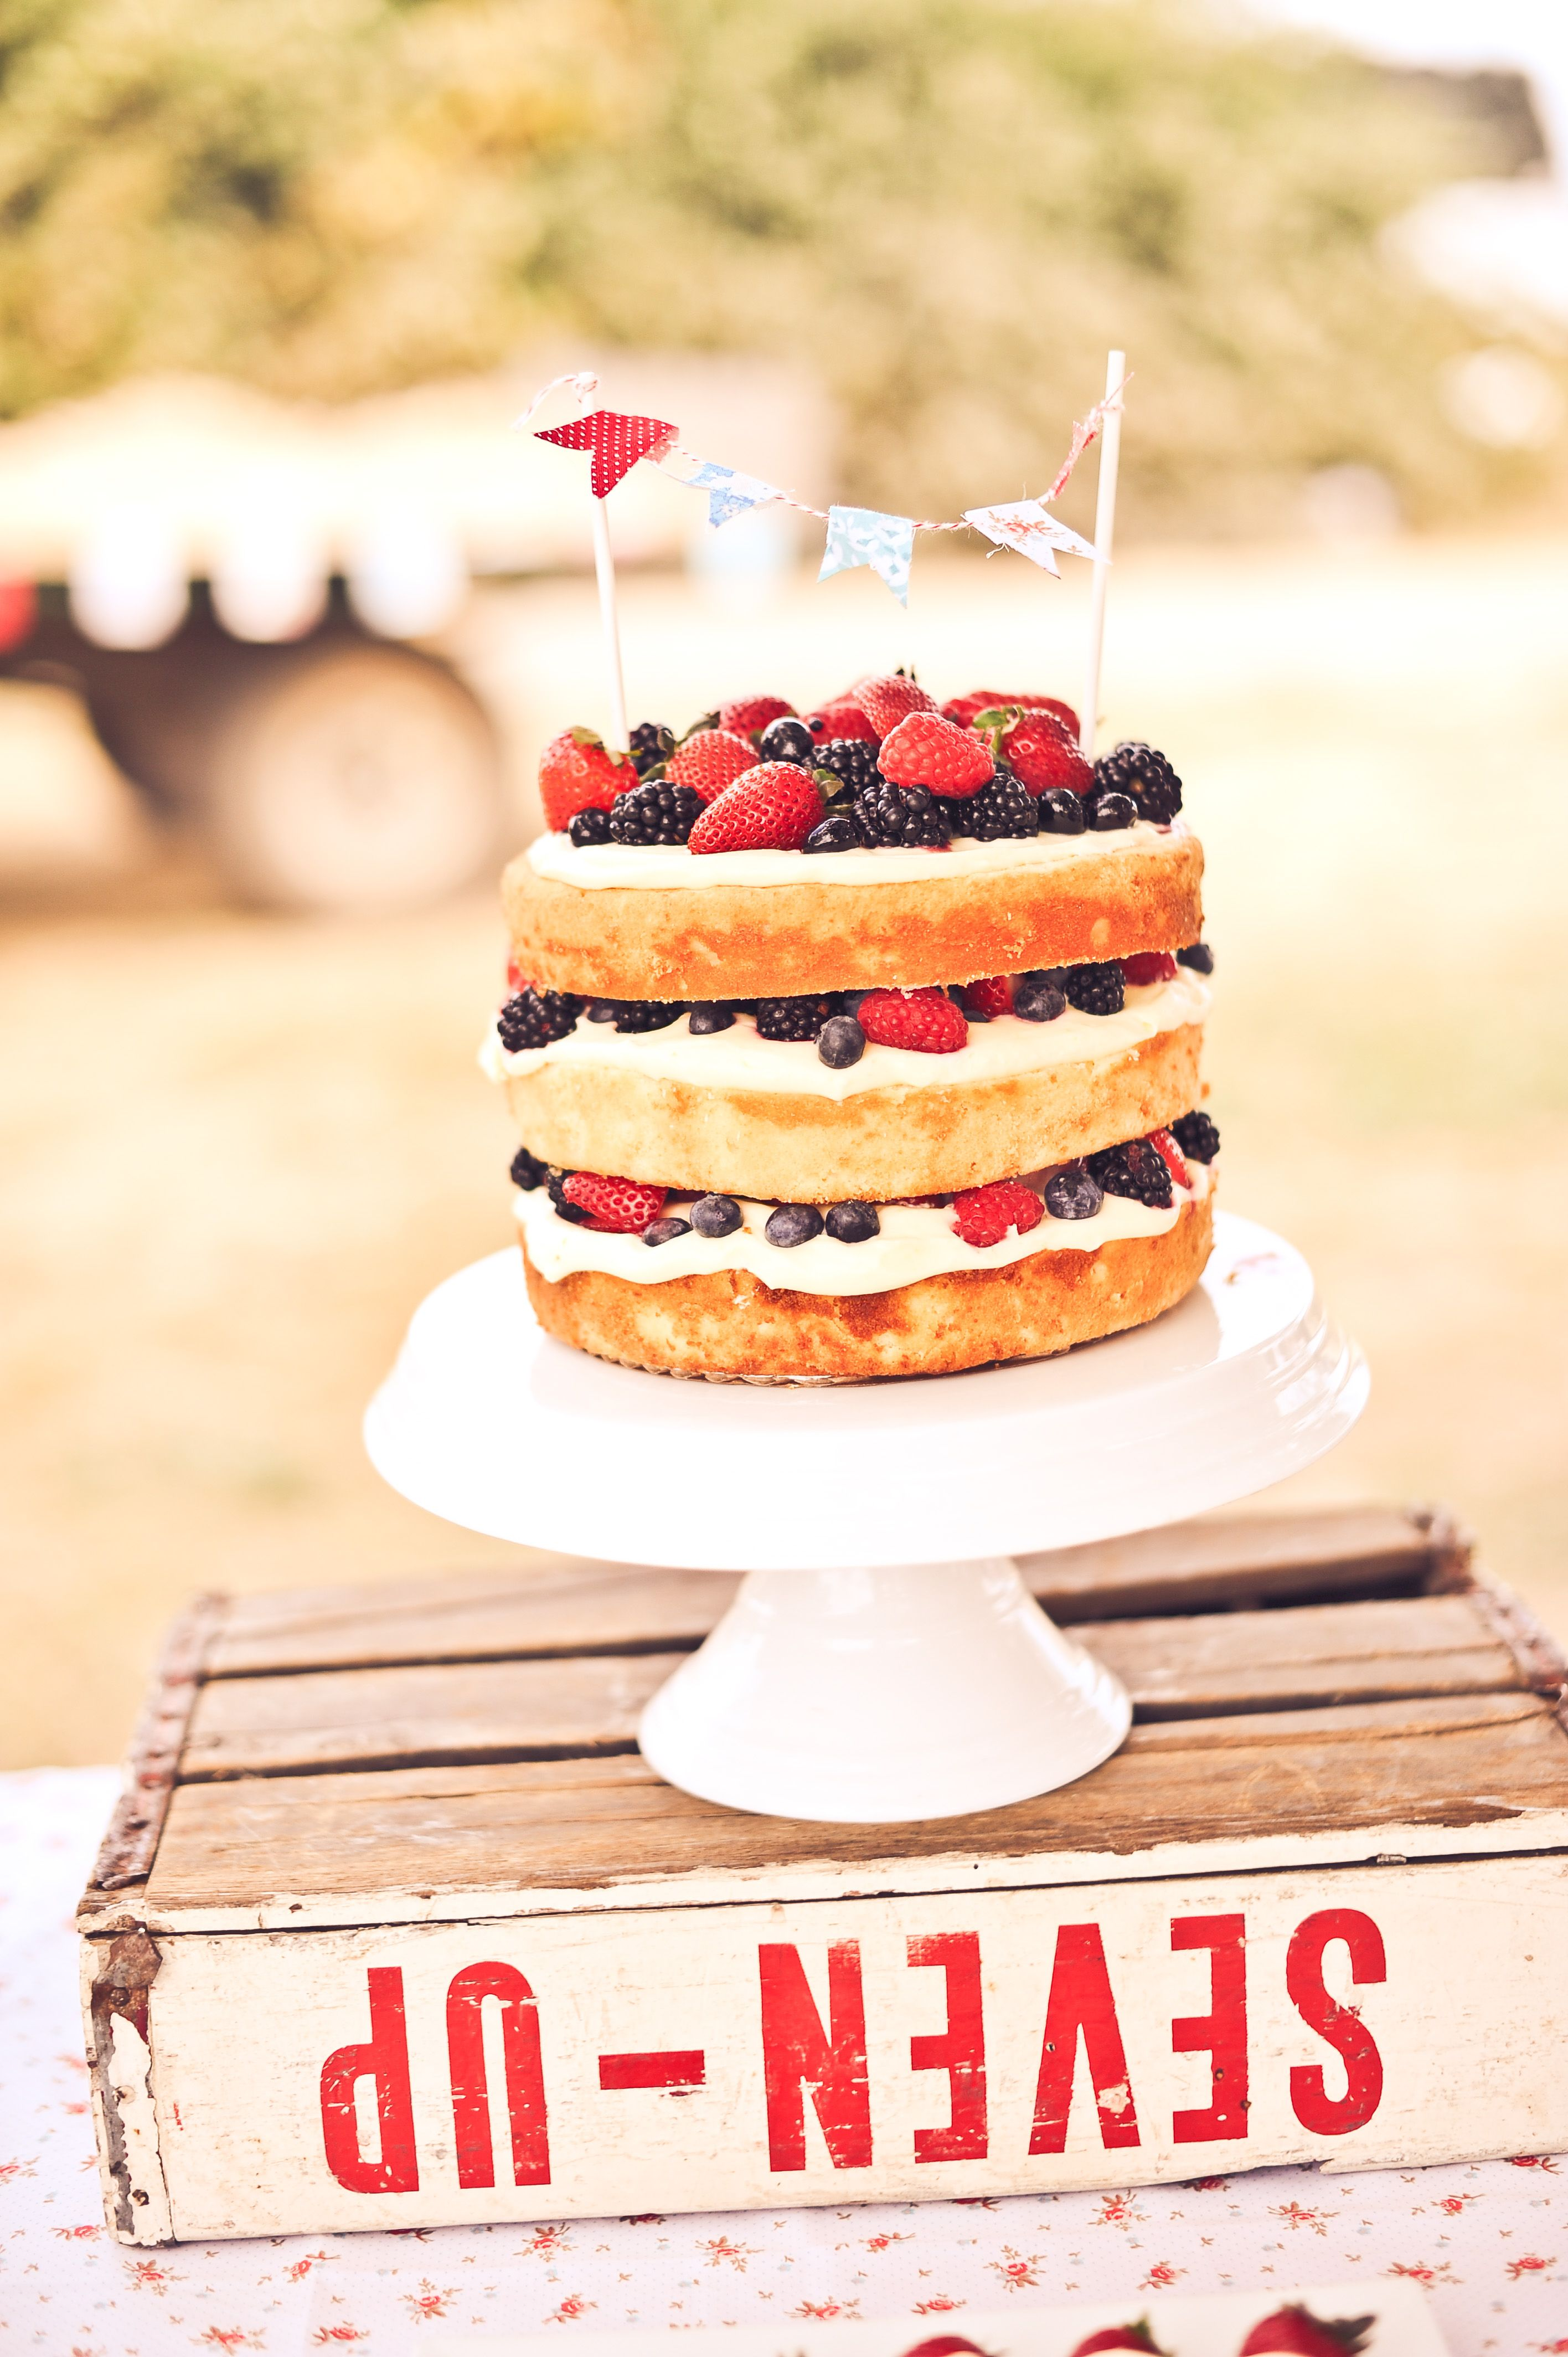 Stupendous A County Fair Inspired 2Nd Birthday The Sweet Lulu Blog Funny Birthday Cards Online Inifodamsfinfo